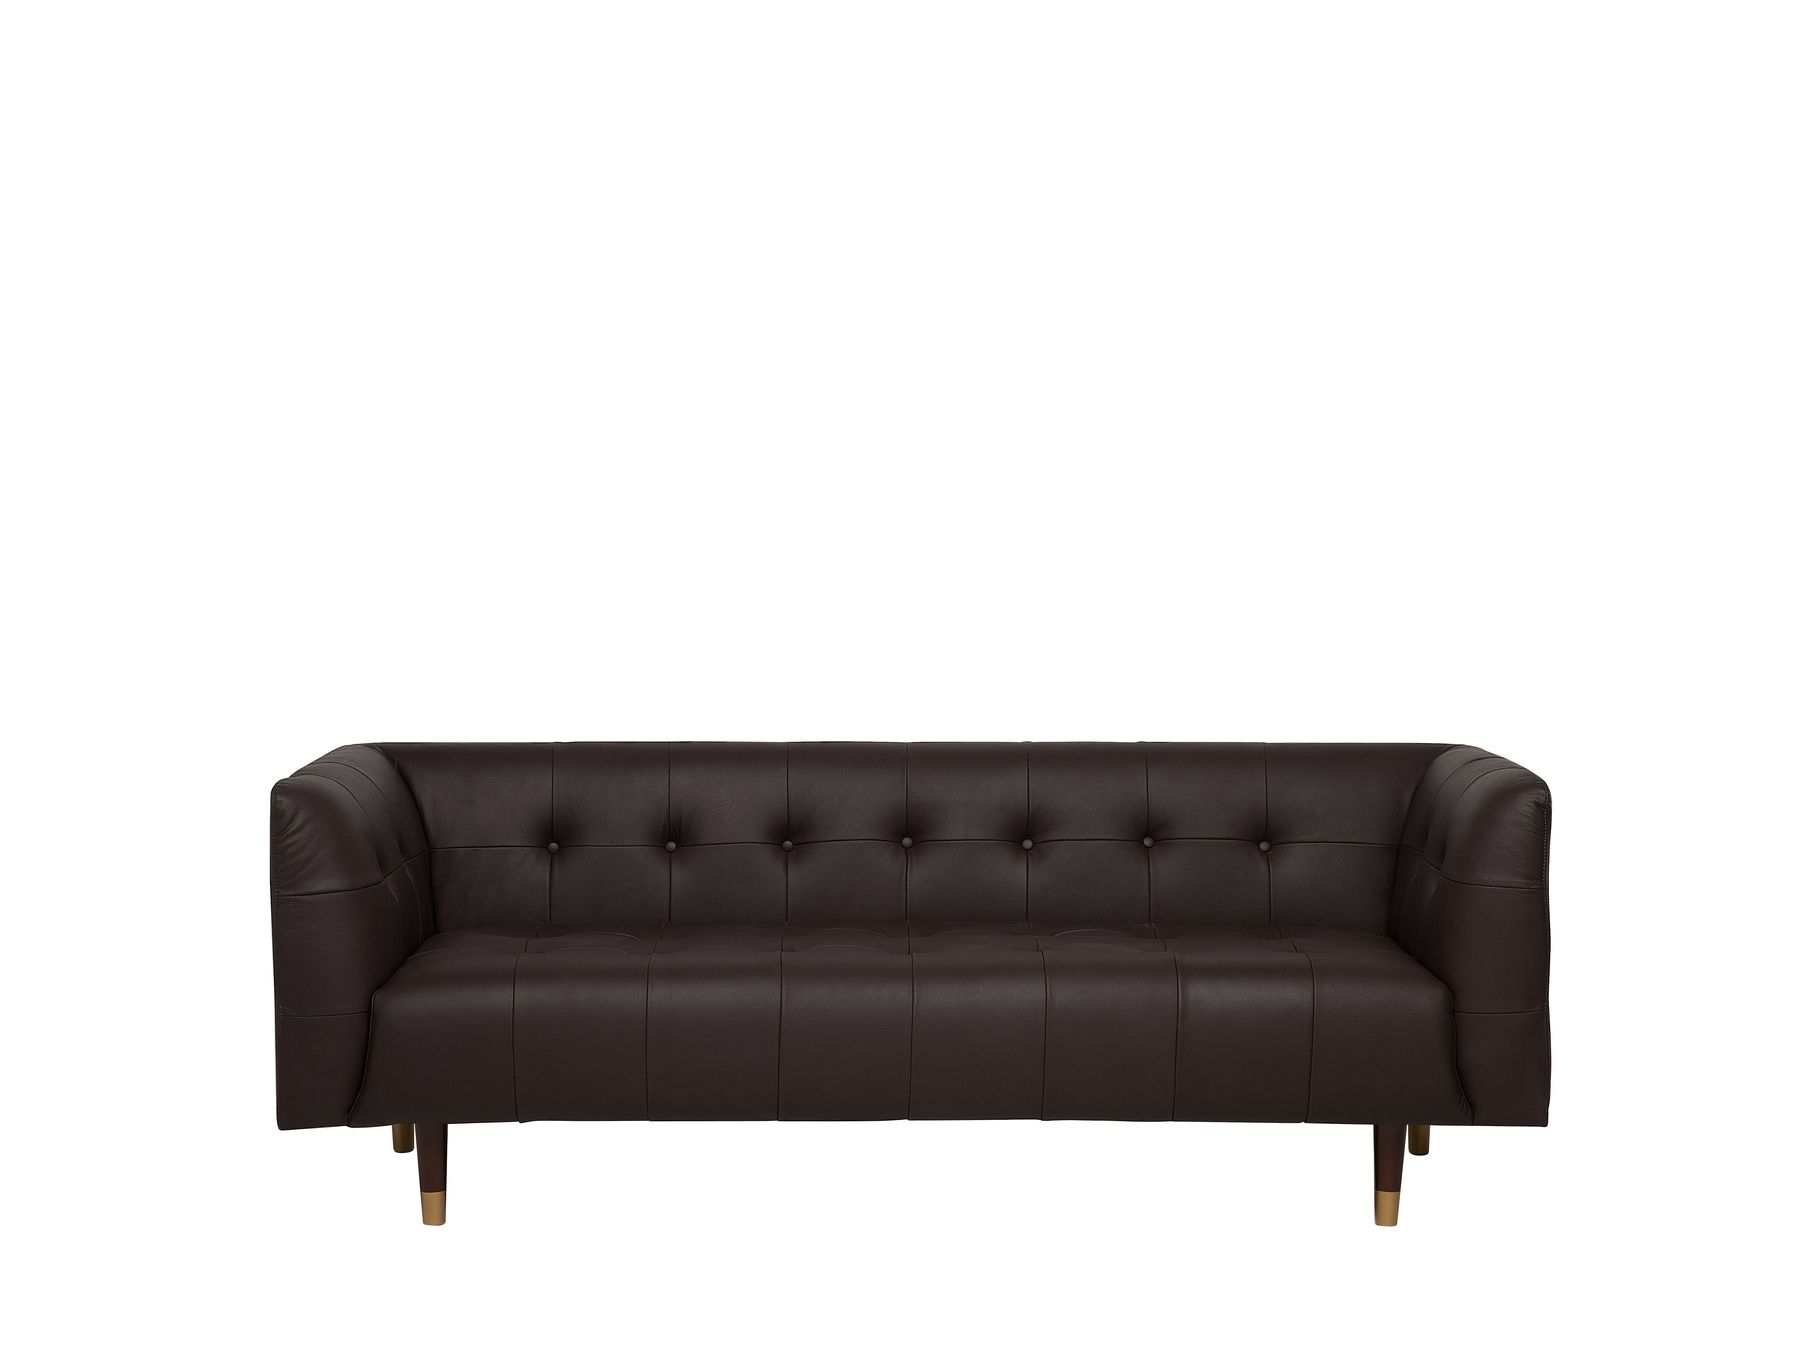 Full Size of 3 Sitzer Sofa Mit Schlaffunktion Rot Relaxfunktion Ikea Ektorp Bettkasten Bettfunktion Poco Leder Roller 5c42637db1f1f Lounge Garten Garnitur Bunt Petrol Sofa 3 Sitzer Sofa